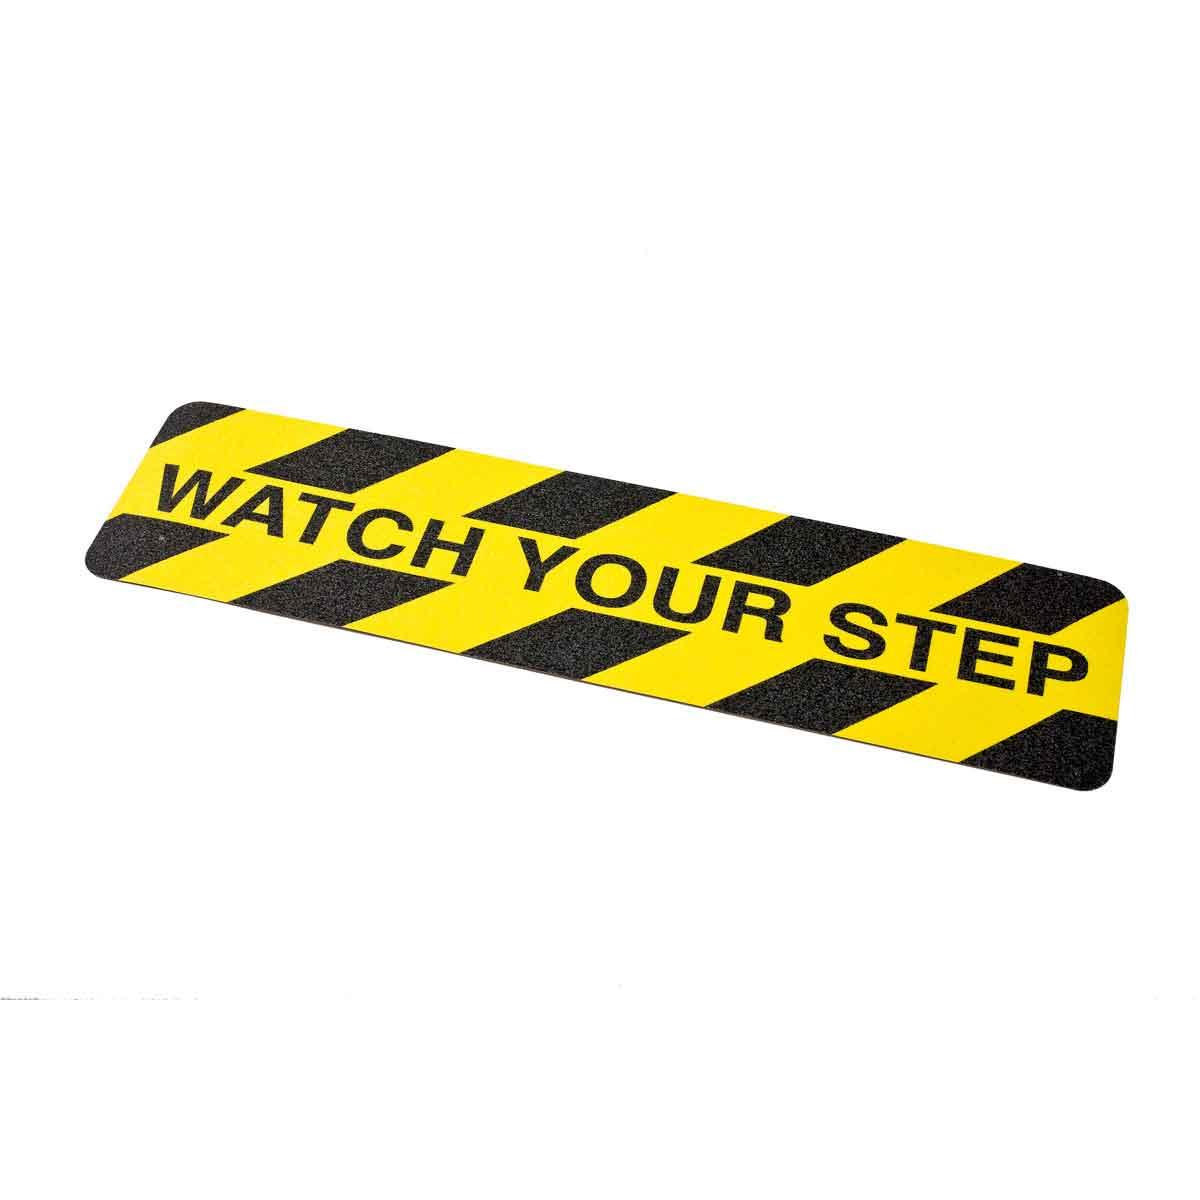 Brady® 78163 Die-Cut Laminated Non-Reflective Anti-Skid Hazard Marking Cleat, 24 in L x 6 in W x 0.026 in THK, B-916 Polyester